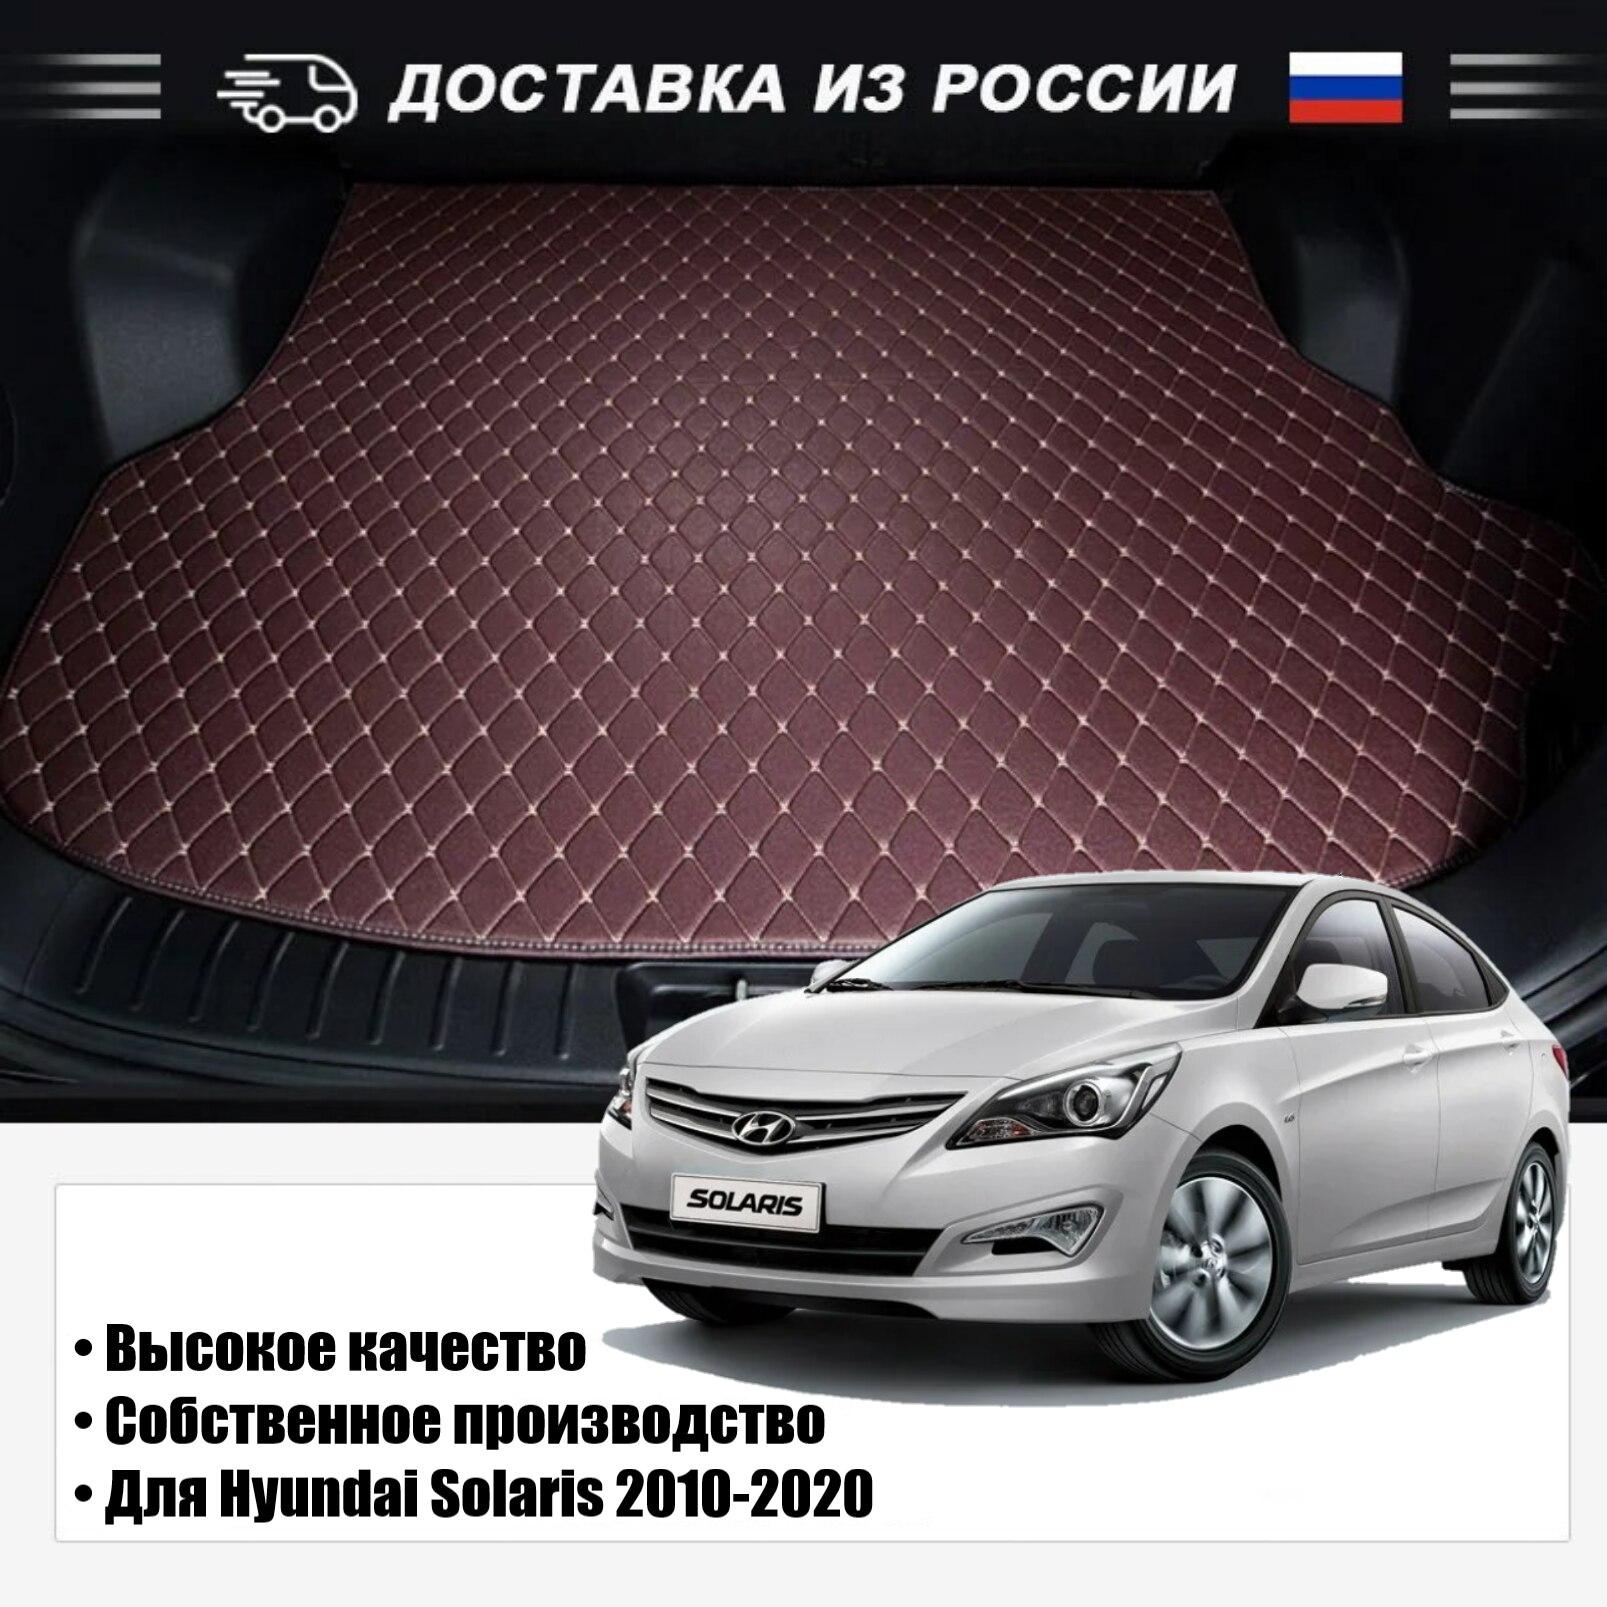 AUTOROWN PU Leather Car Trunk Mat For Hyundai Solaris 2010-2020 Waterproof Floor Mats Auto Interior Accessories